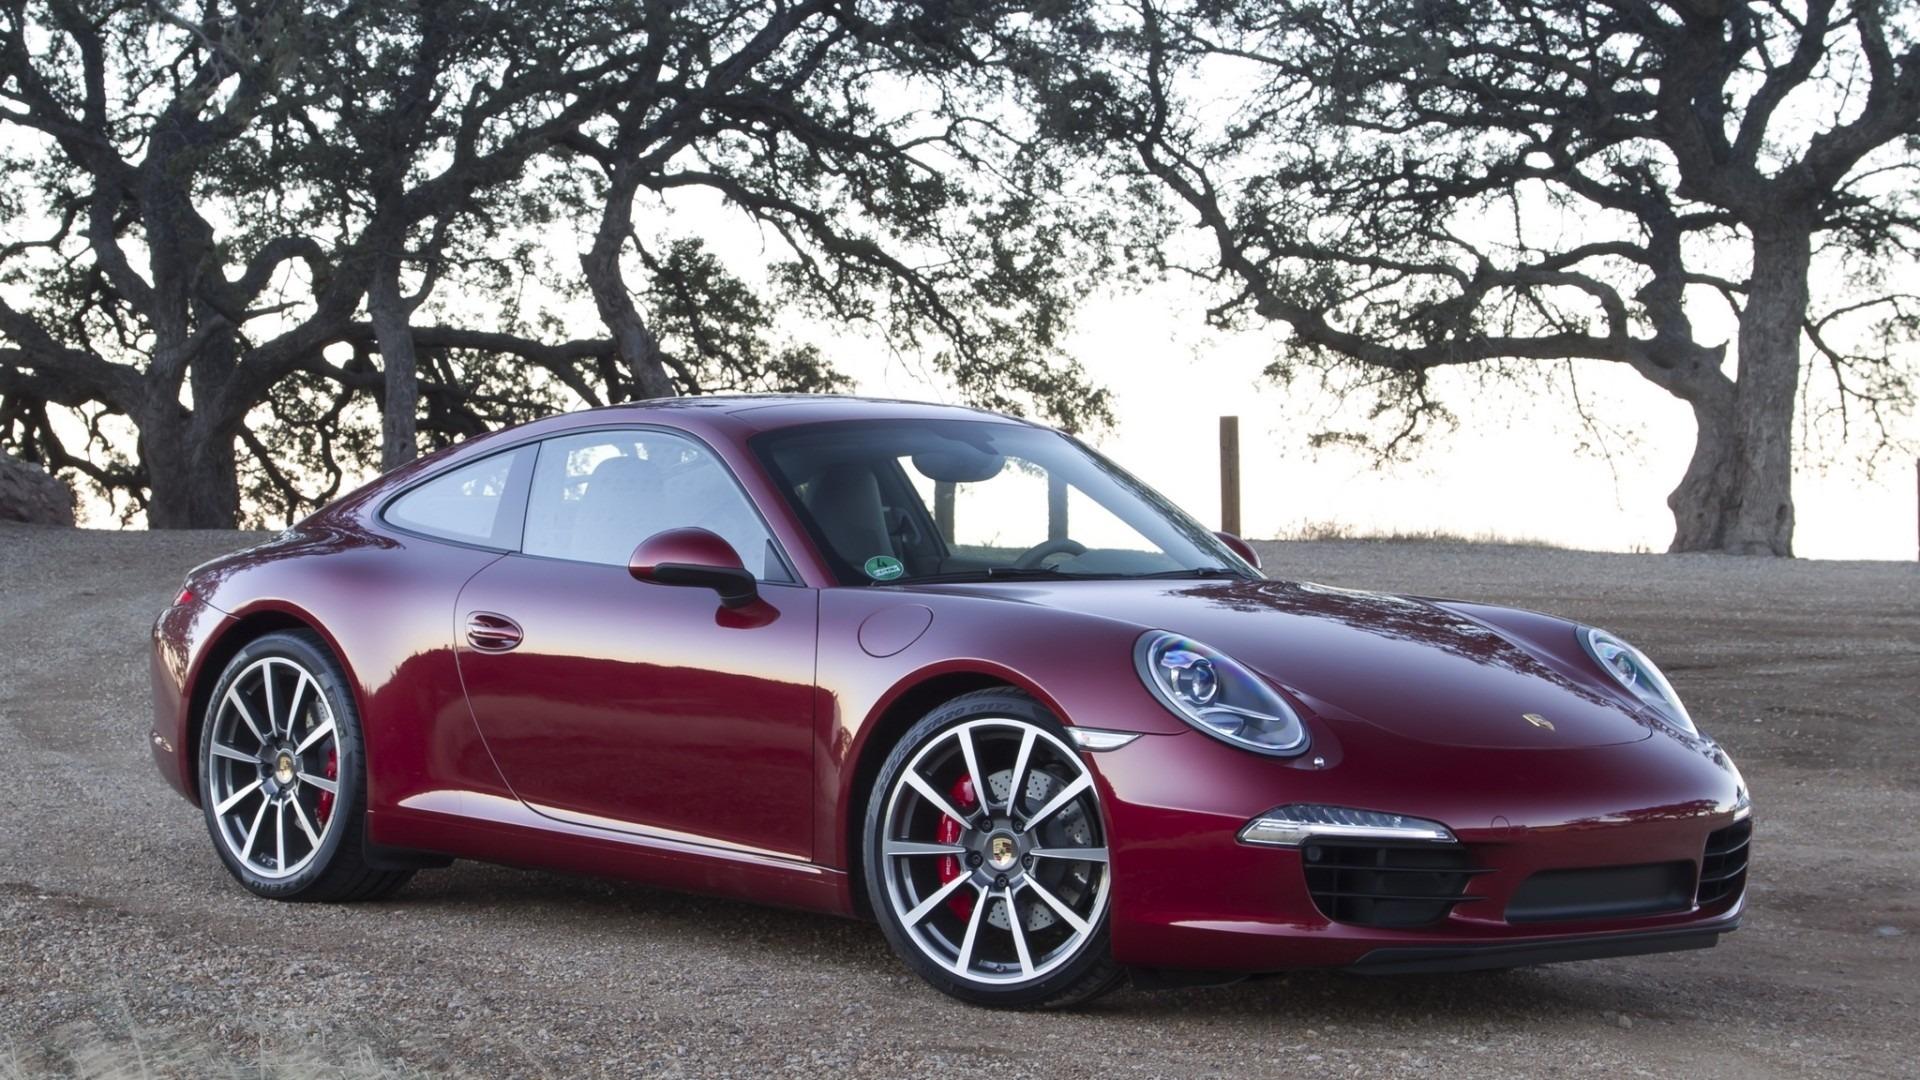 Porsche Hd Wallpapers 1080p: Porsche HD Wallpapers 1080p